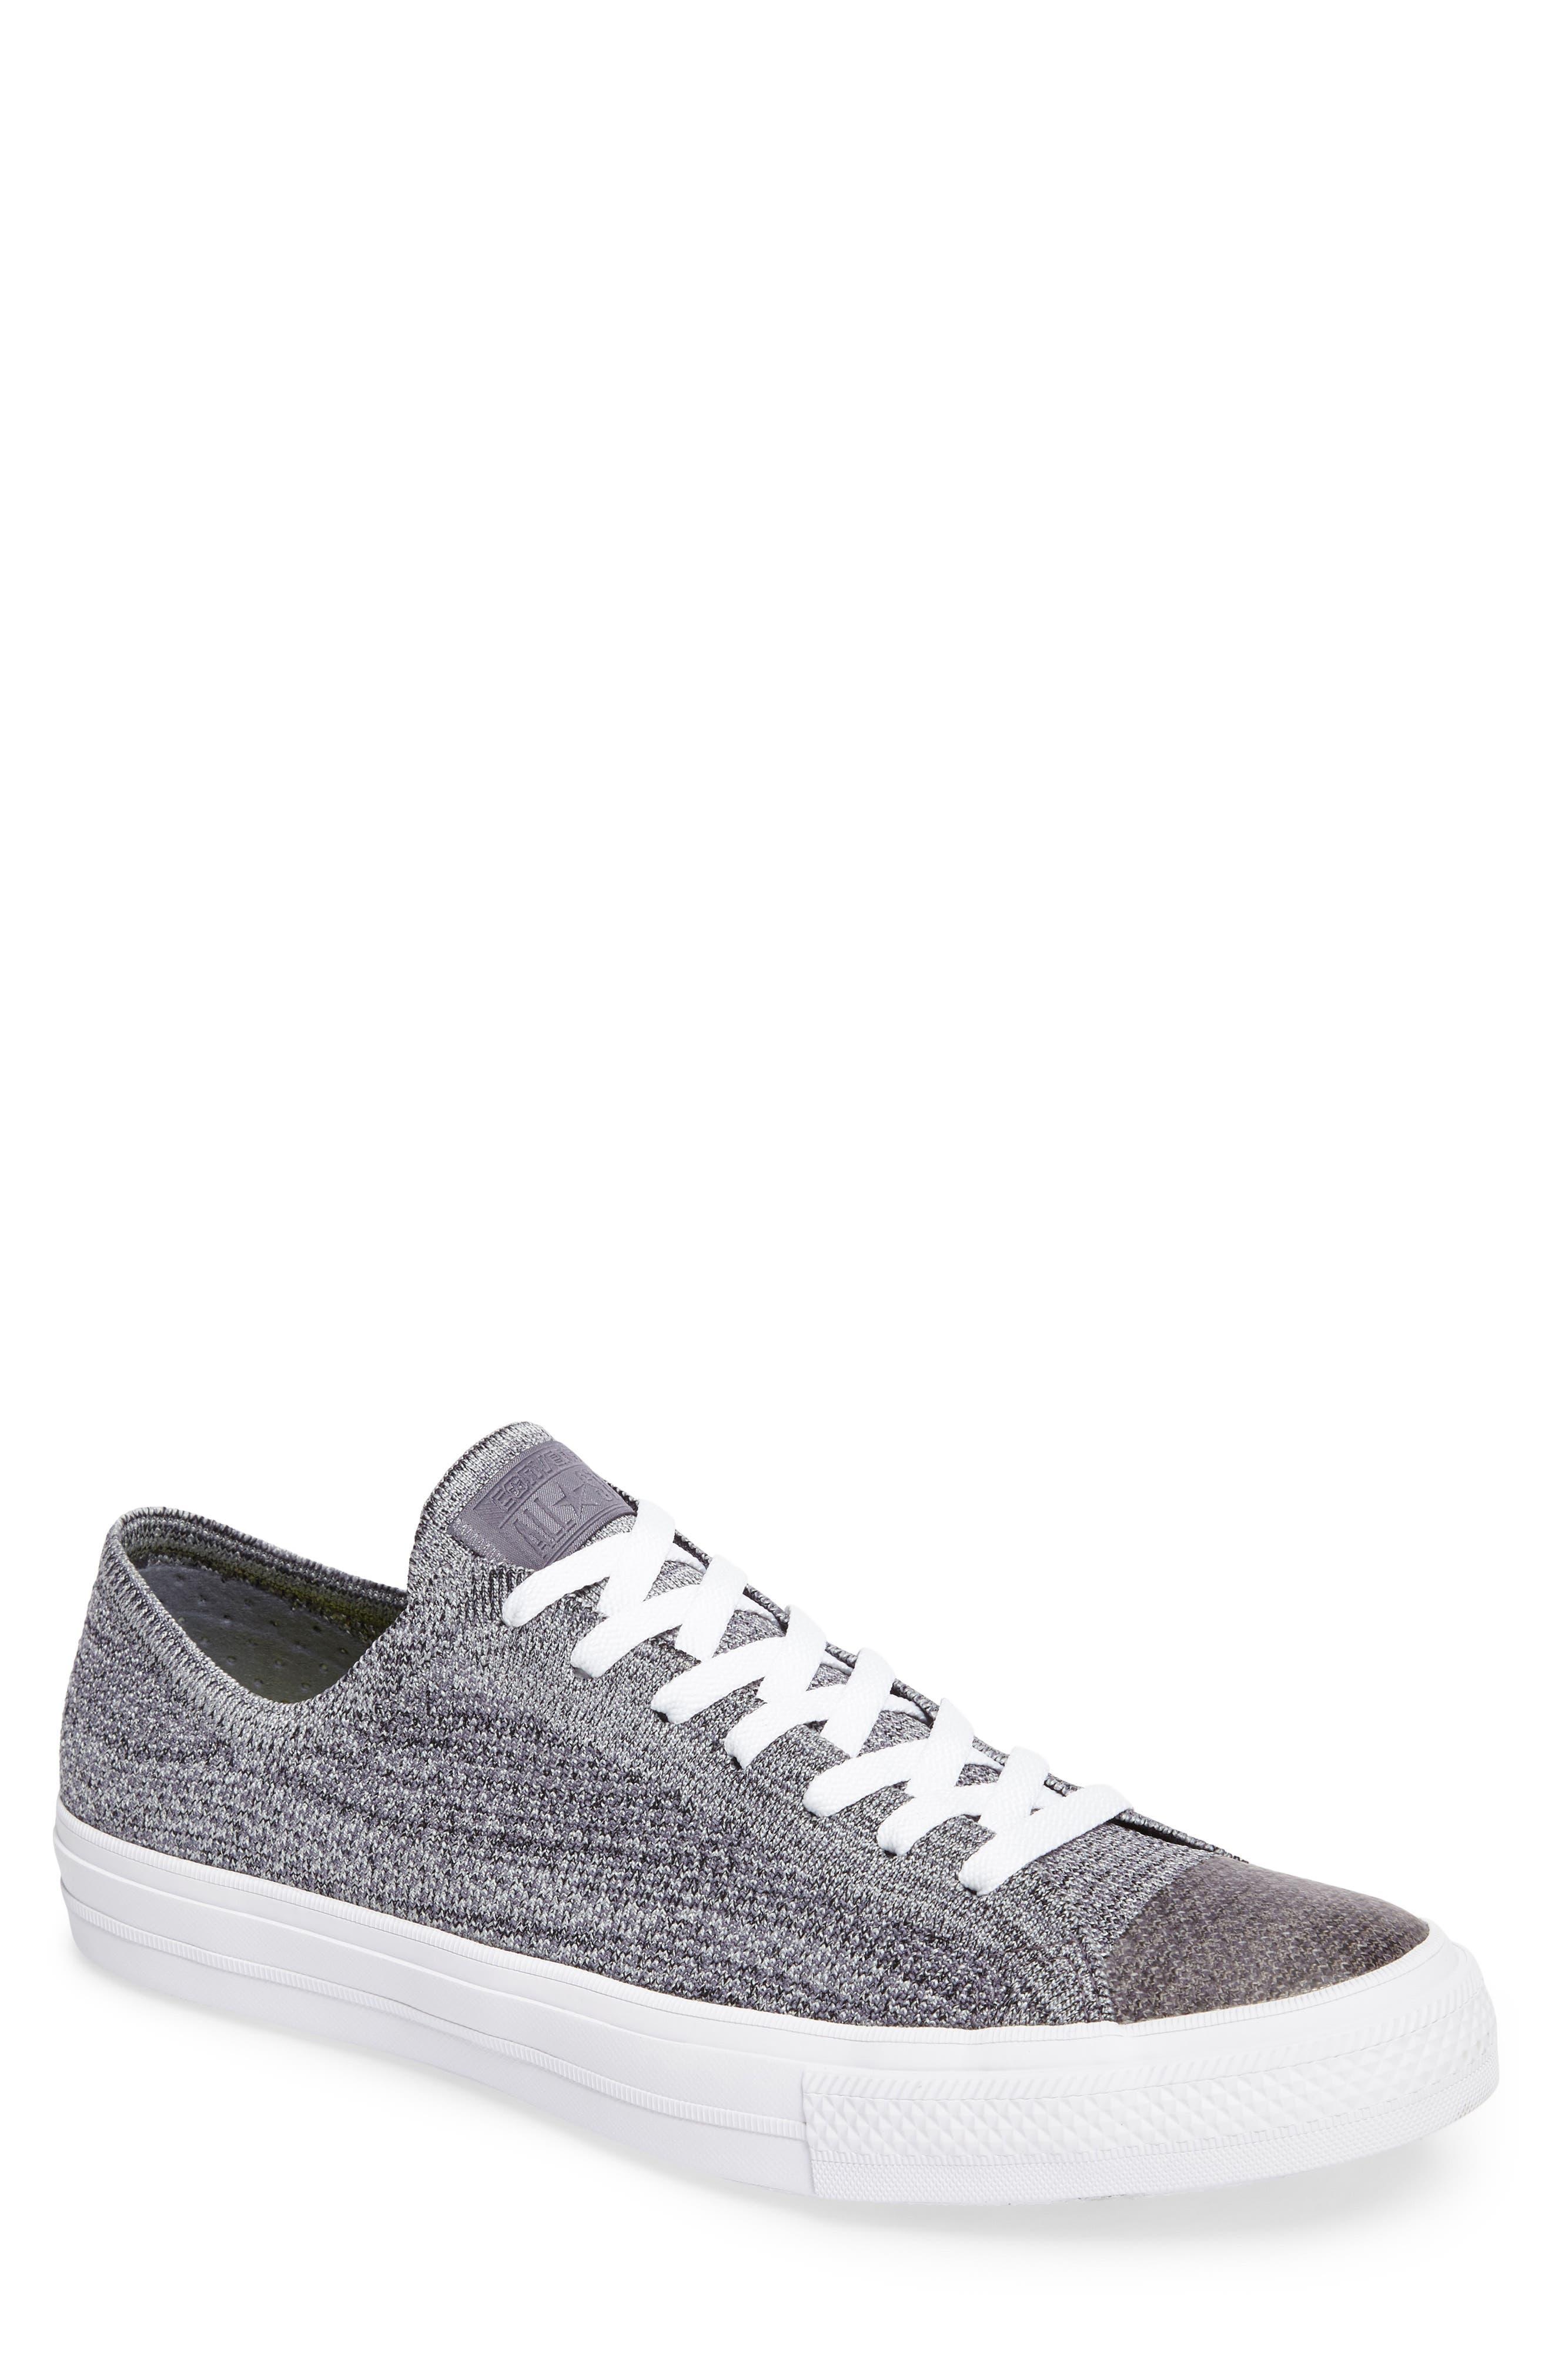 Alternate Image 1 Selected - Converse Chuck Taylor® All Star® Flyknit Sneaker (Men)